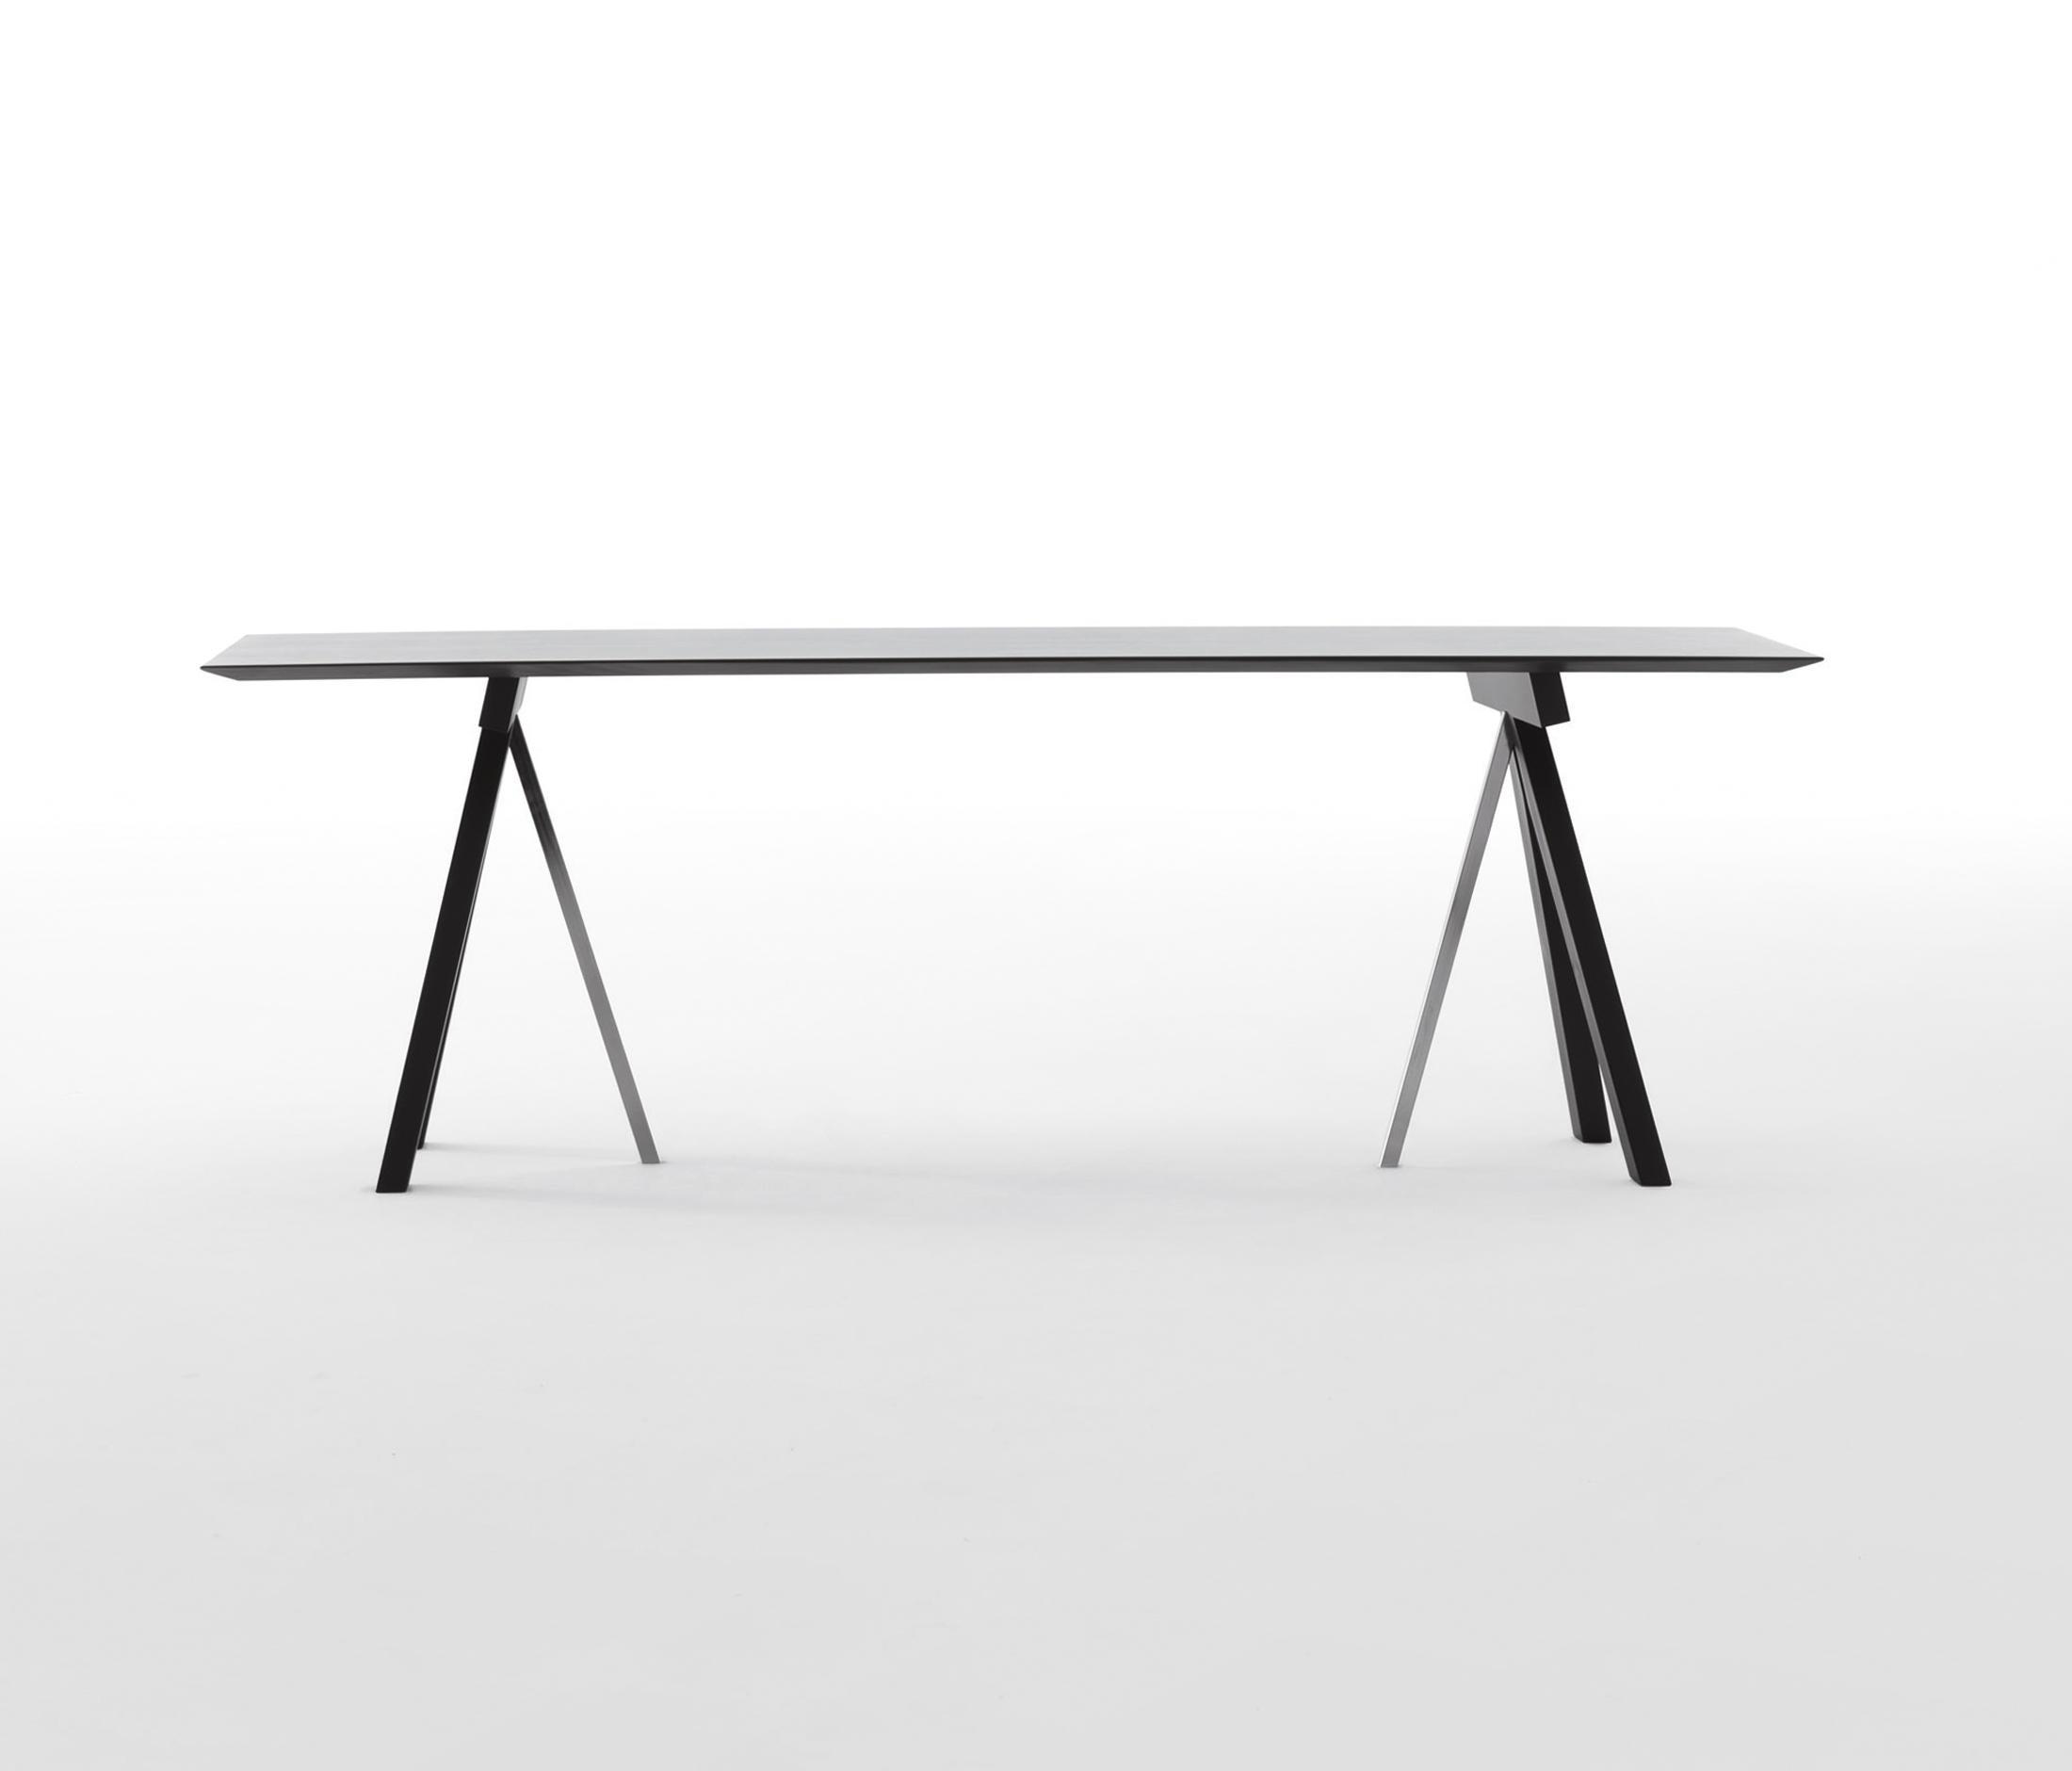 Cavalletti per tavoli design | Decoupageitalia